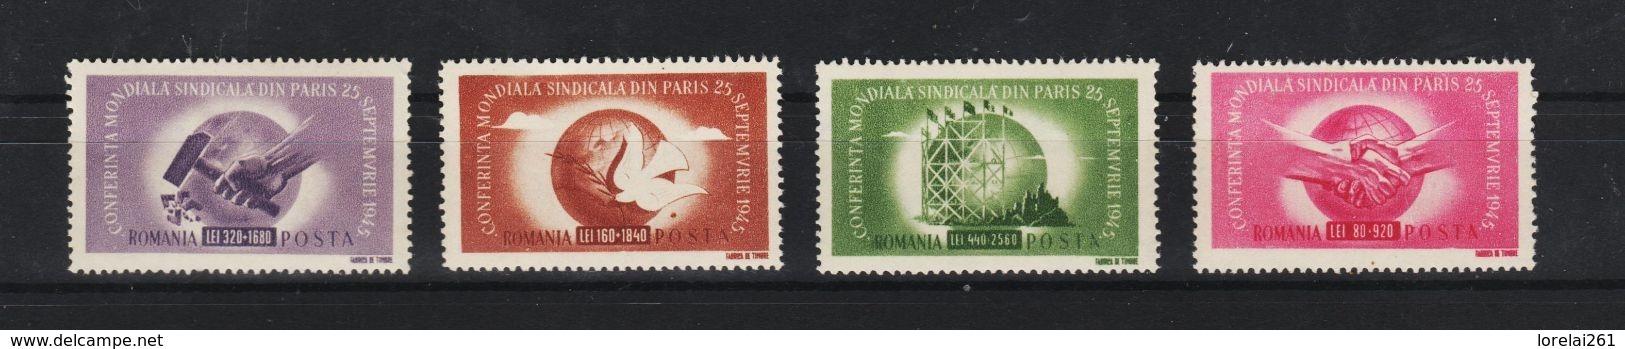 1945 - Congres Syndical De Paris Mi No 917/920  MNH  RAR - 1918-1948 Ferdinand, Carol II. & Mihai I.